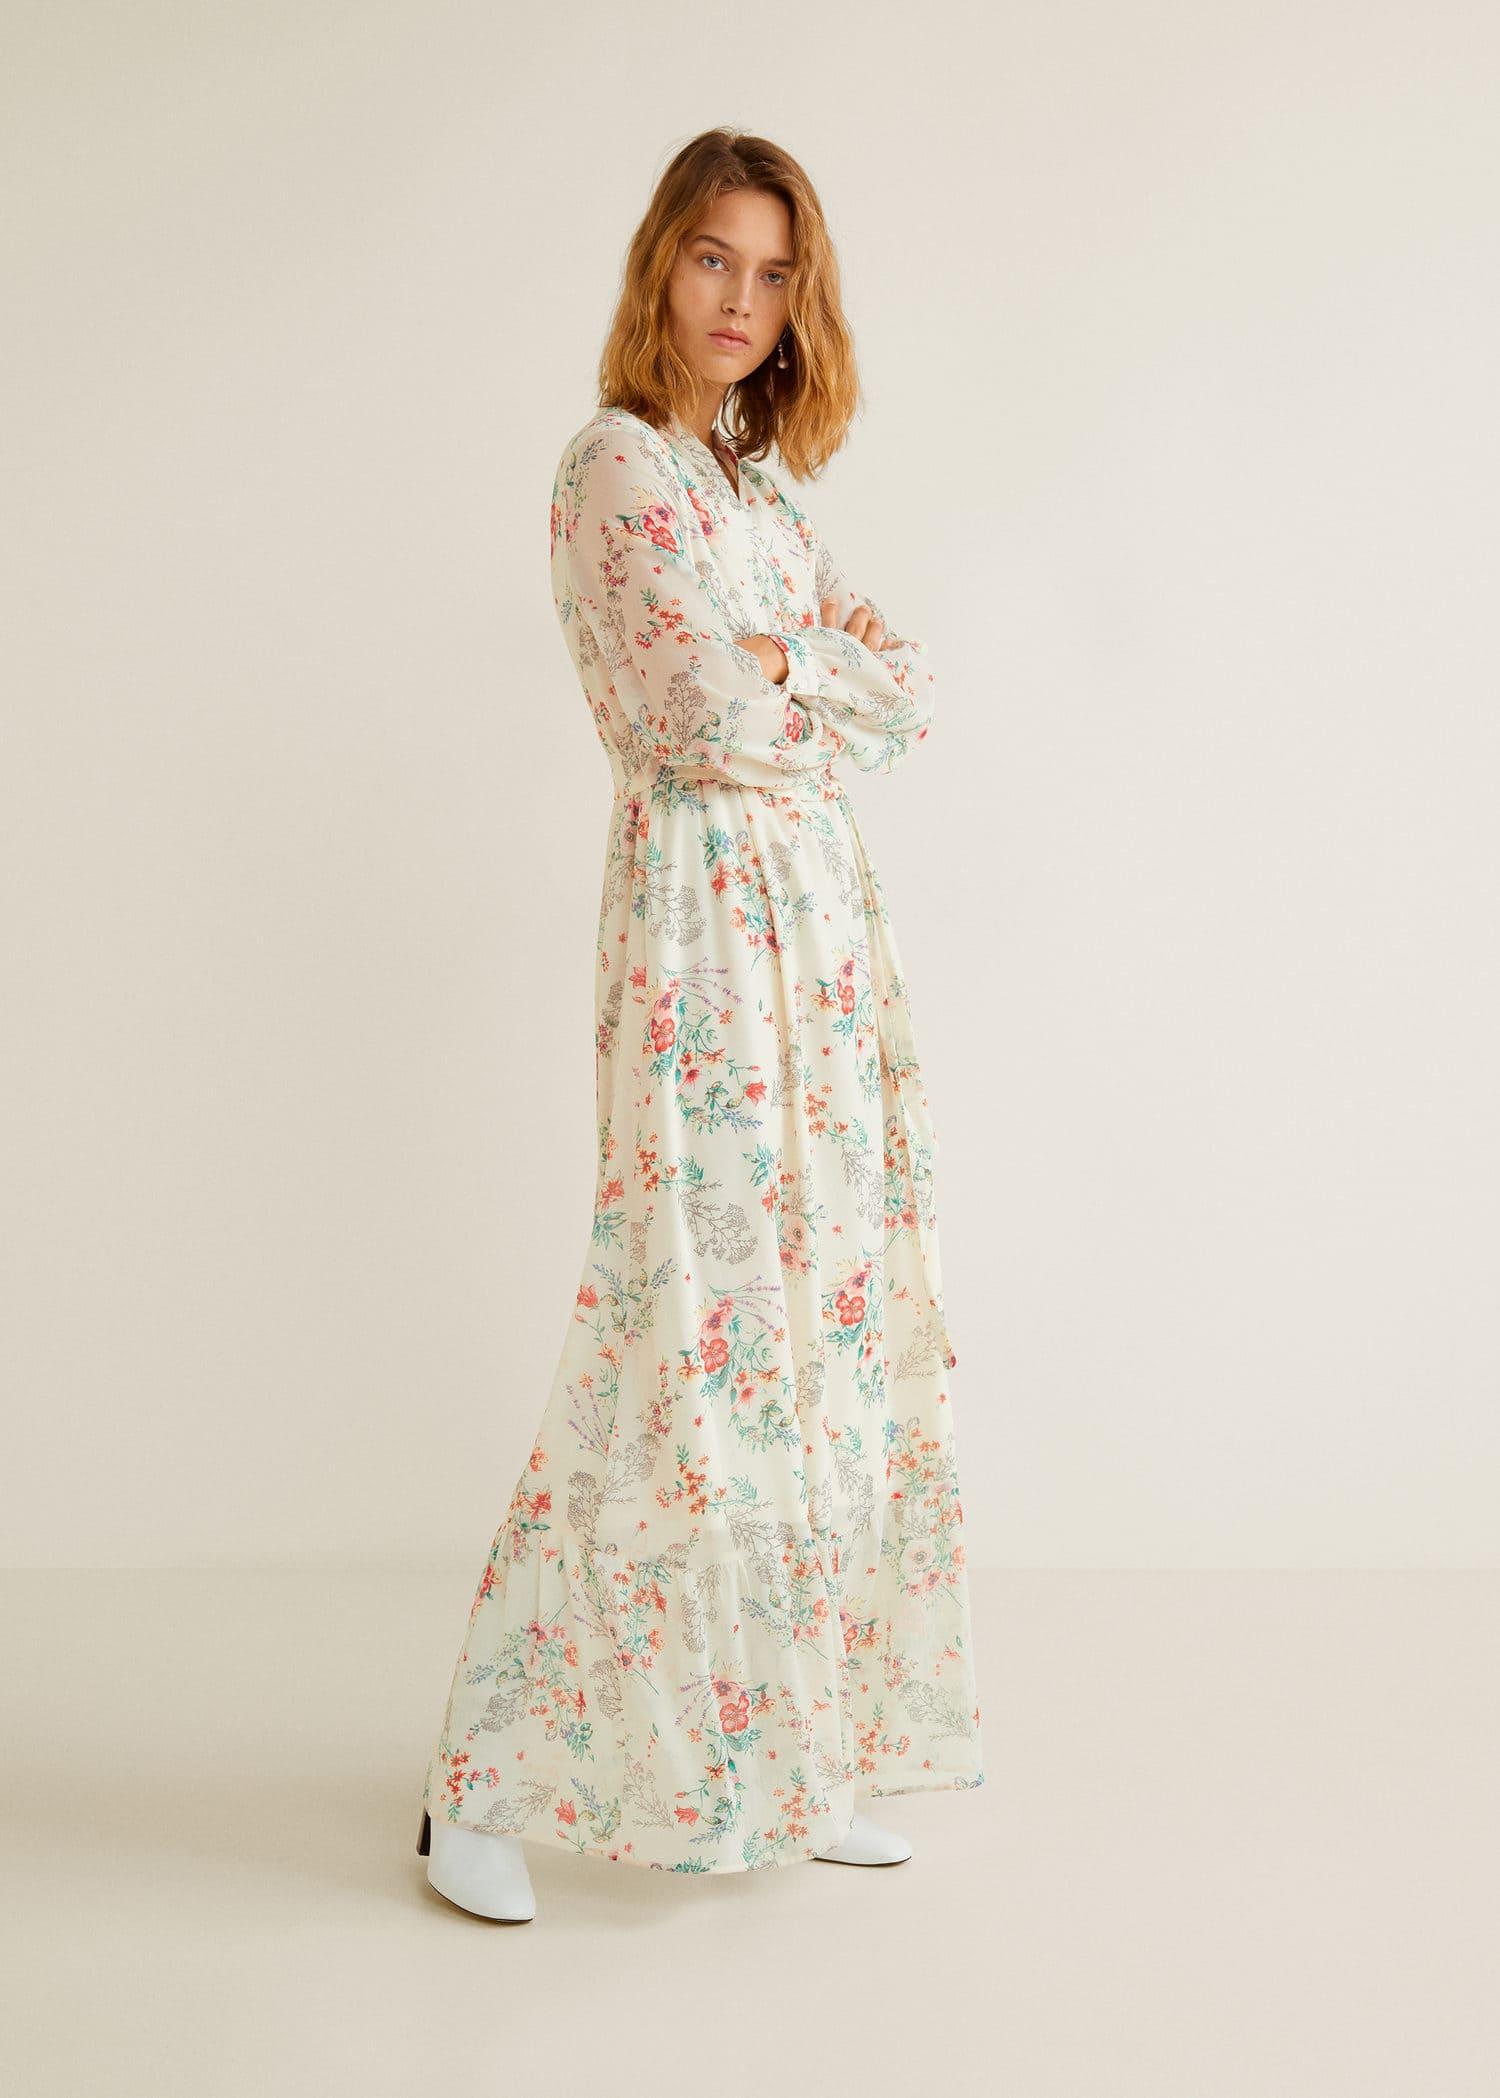 Vestidos largos de flores pequeð³â±as